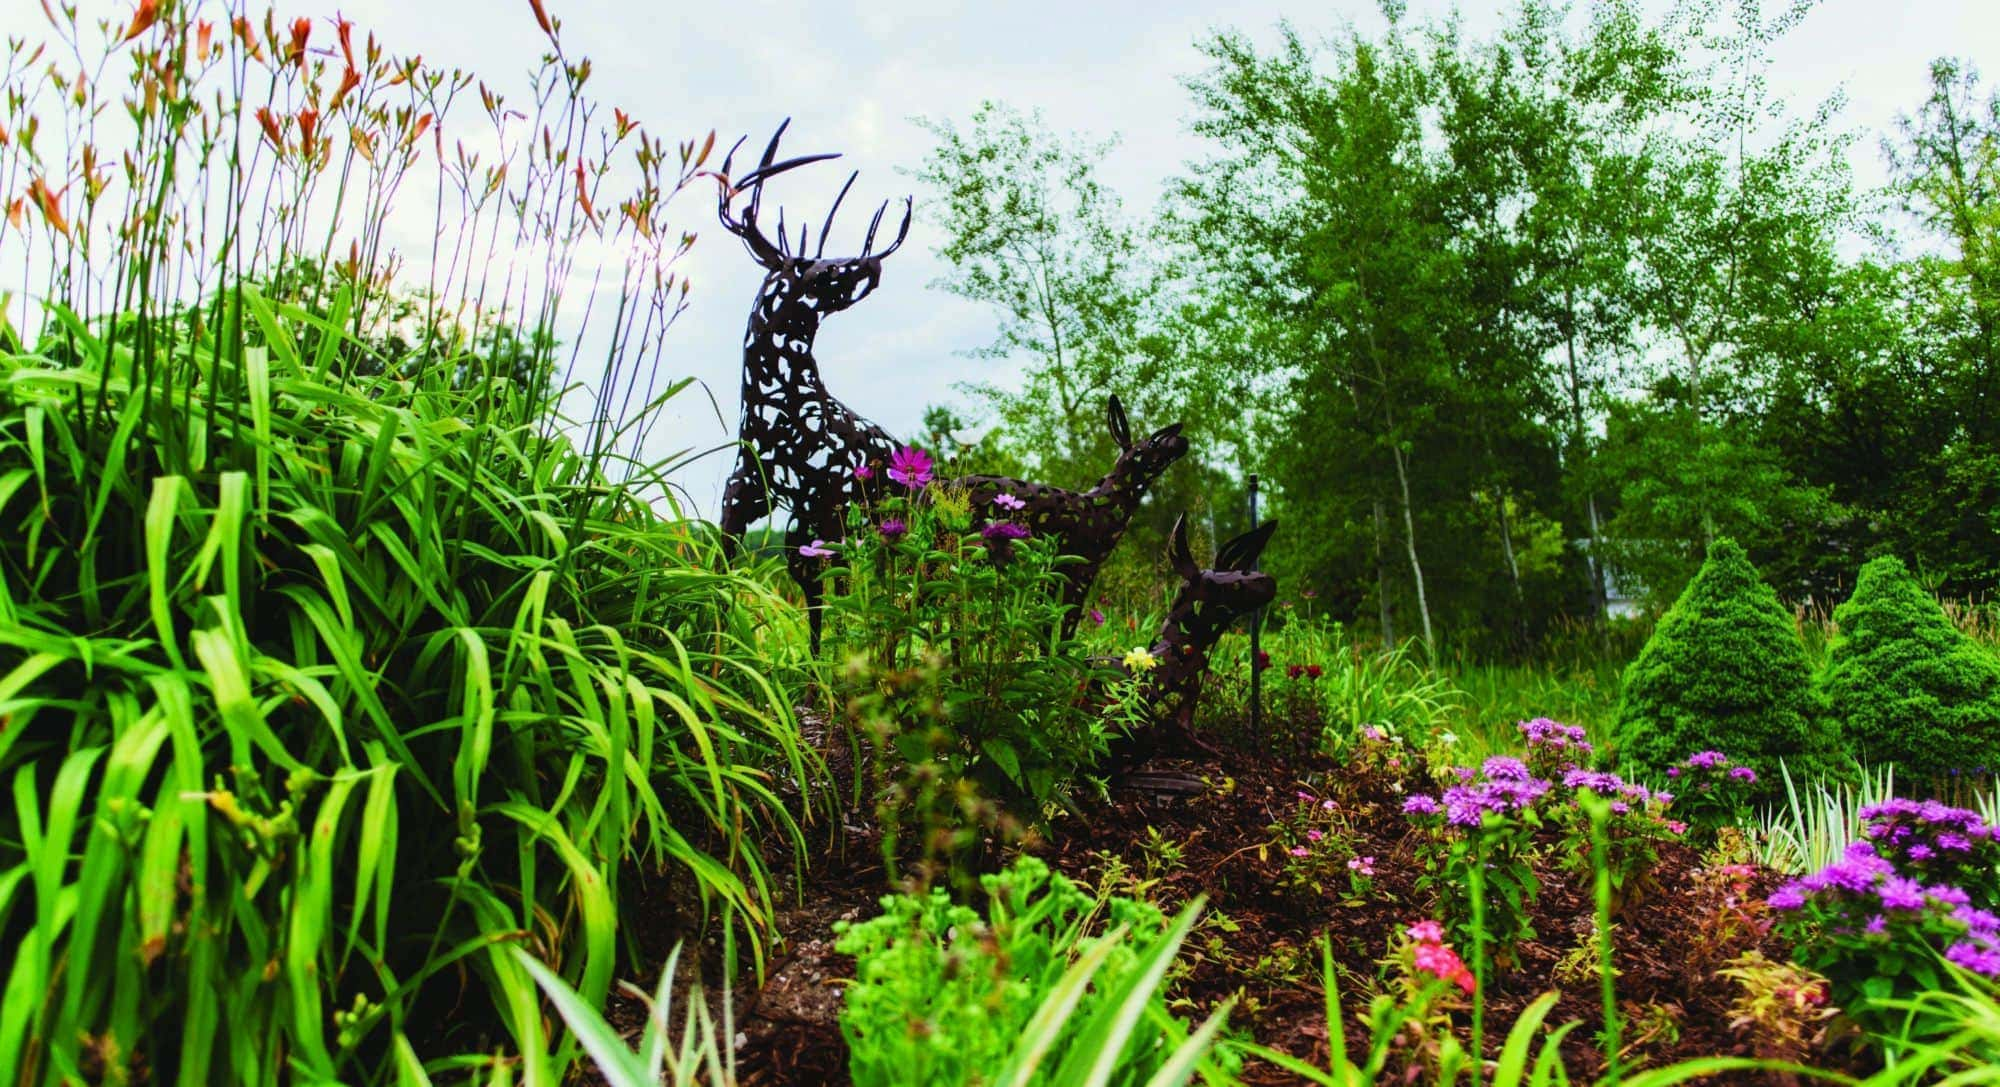 8 Stunning Northern Michigan Gardens & Events - MyNorth.com